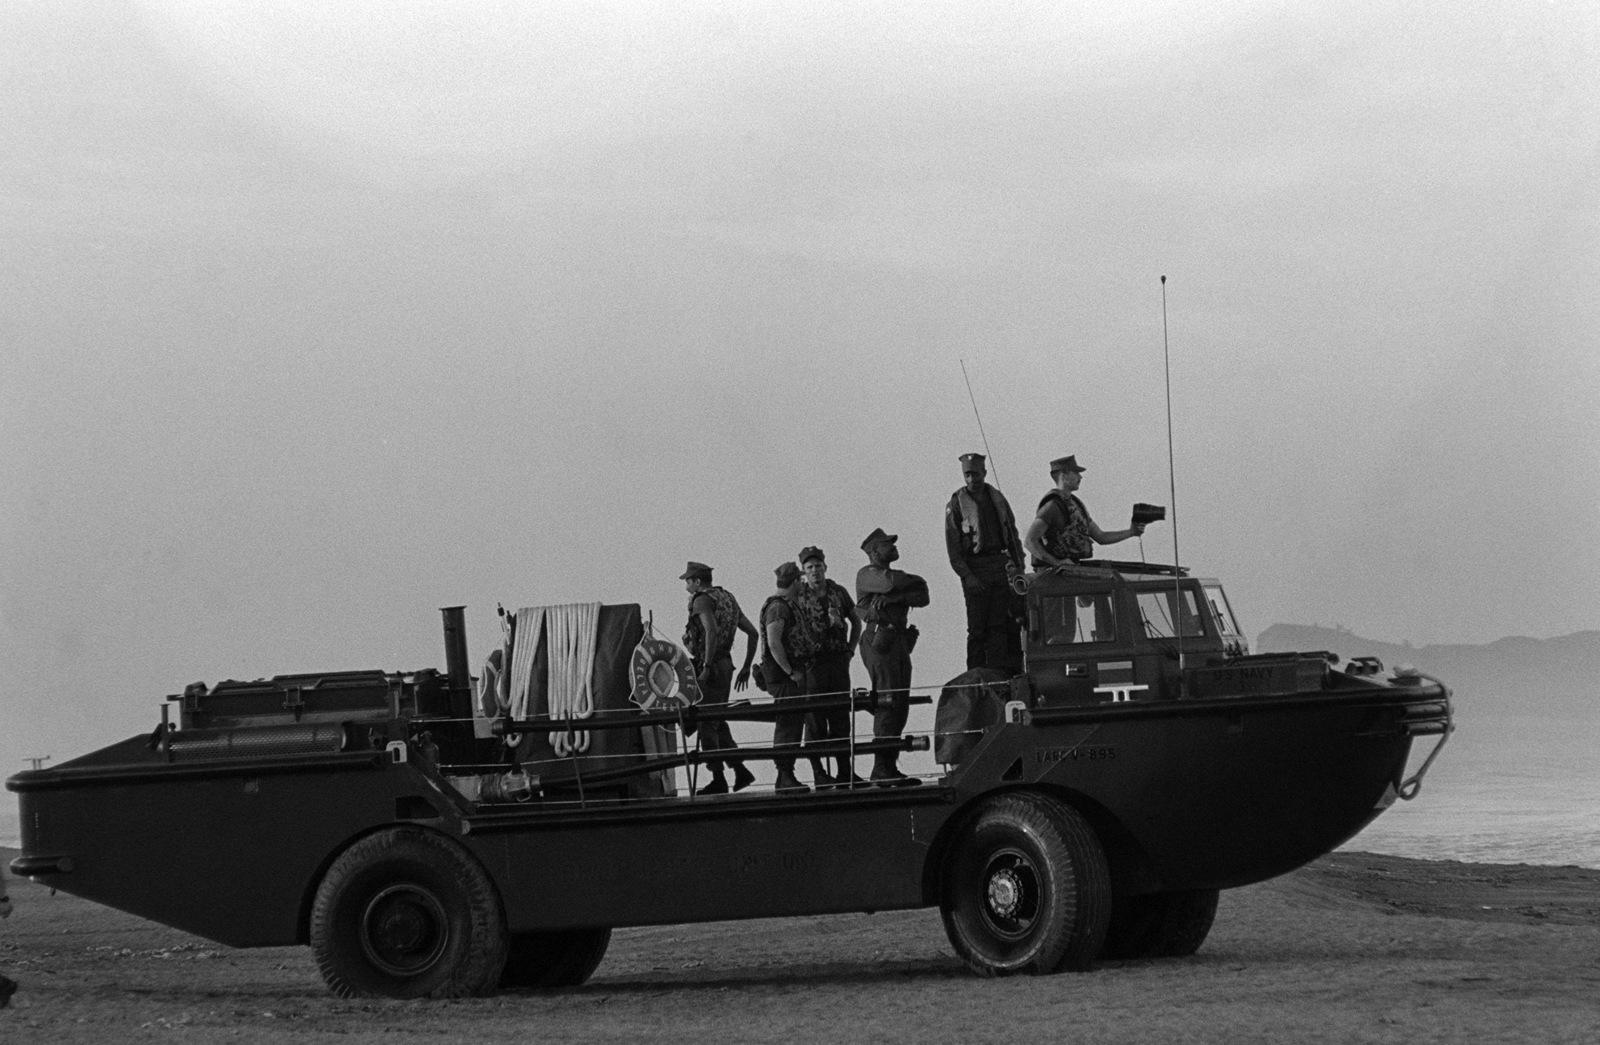 Navy beachmasters come ashore in a LARC-5 amphibious cargo carrier